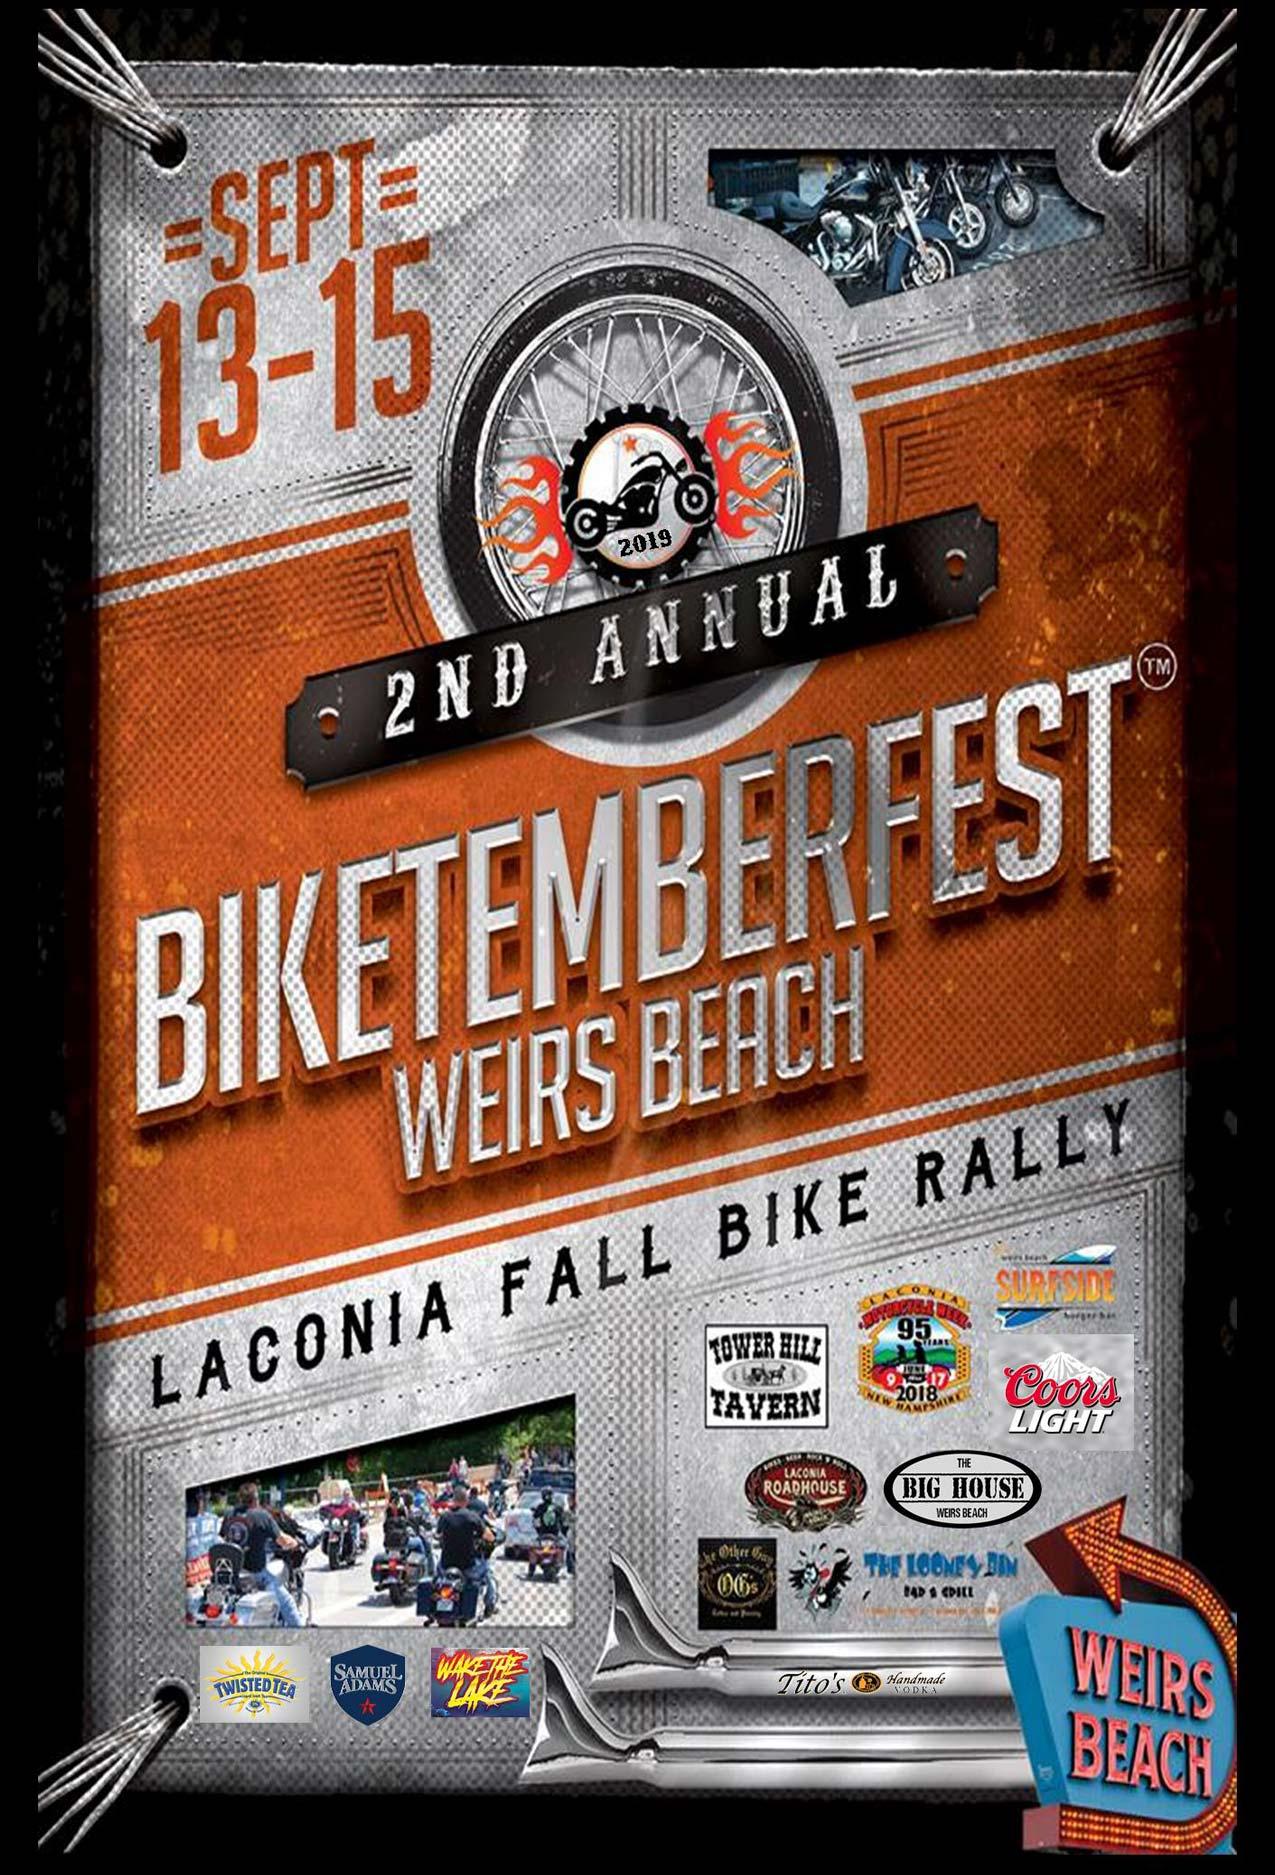 Biketemberfest Flyer